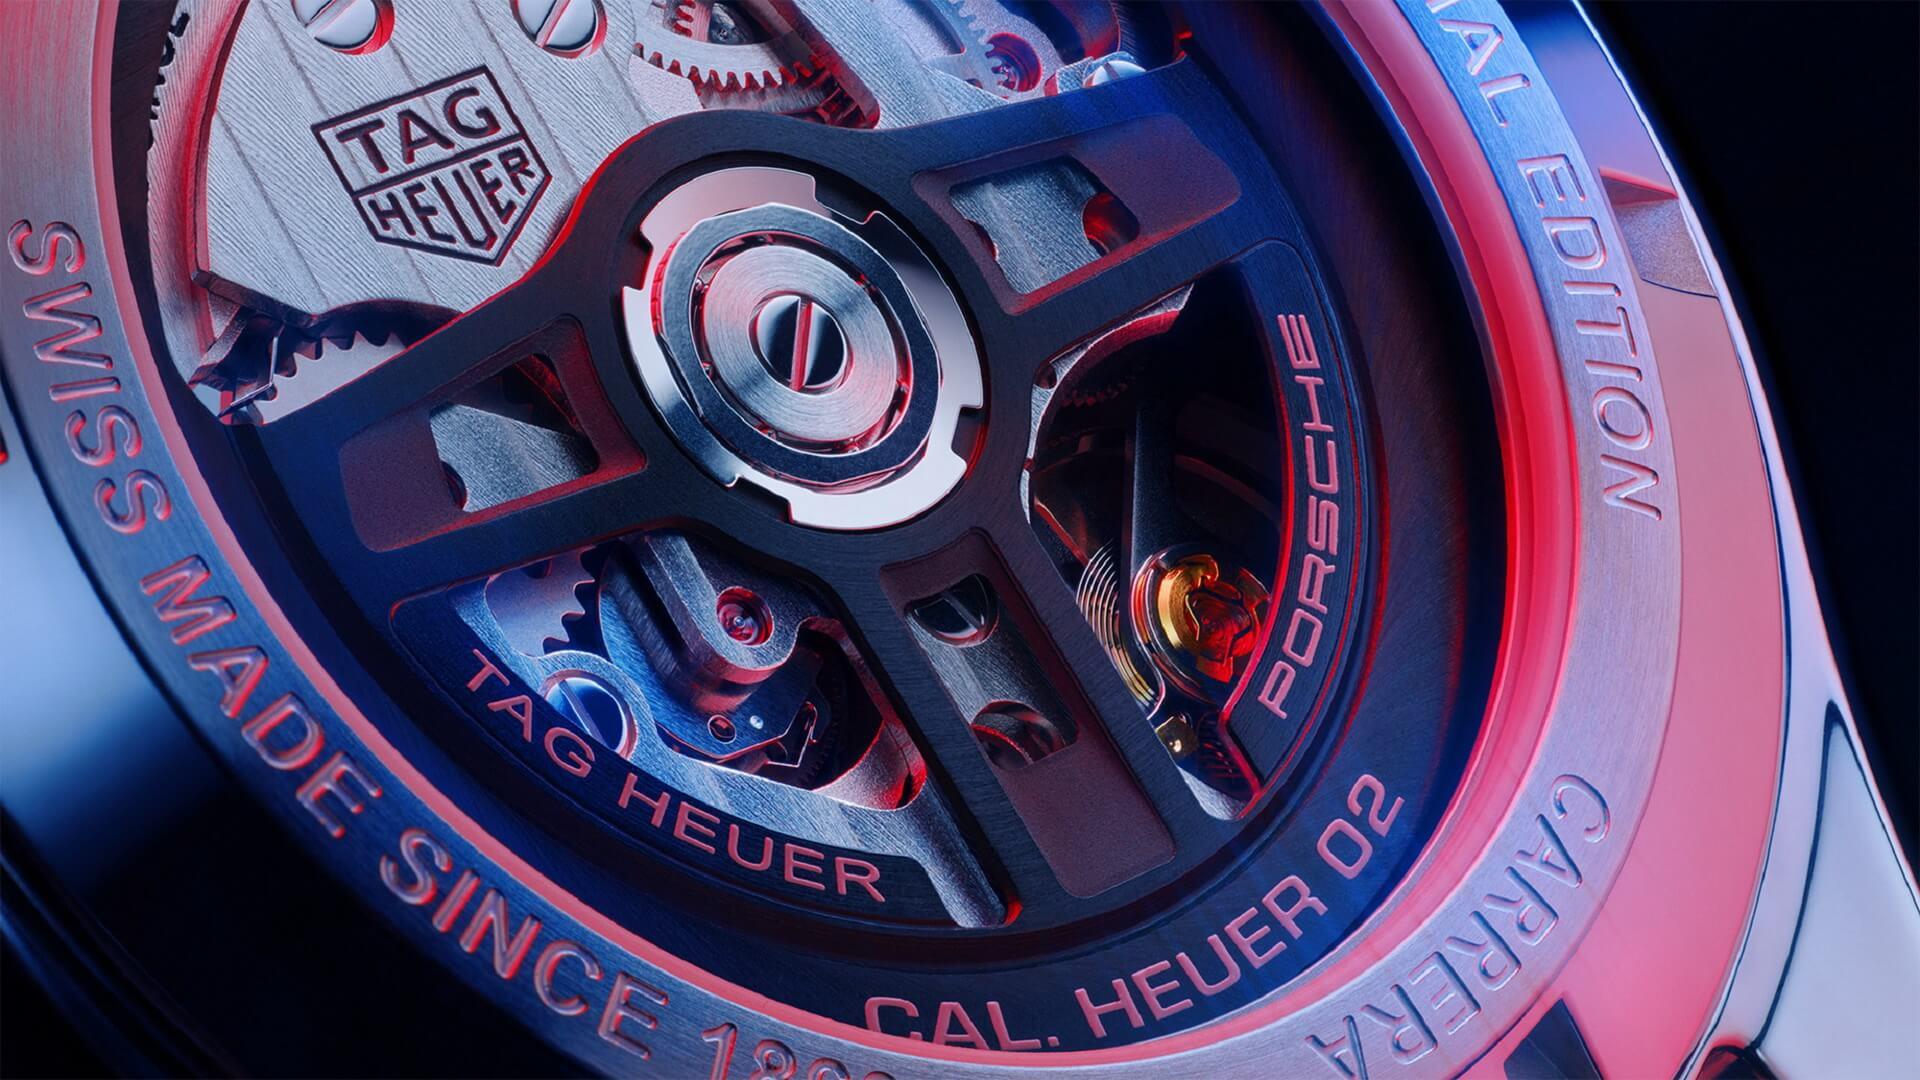 Хронограф TAG Heuer Carrera Porsche